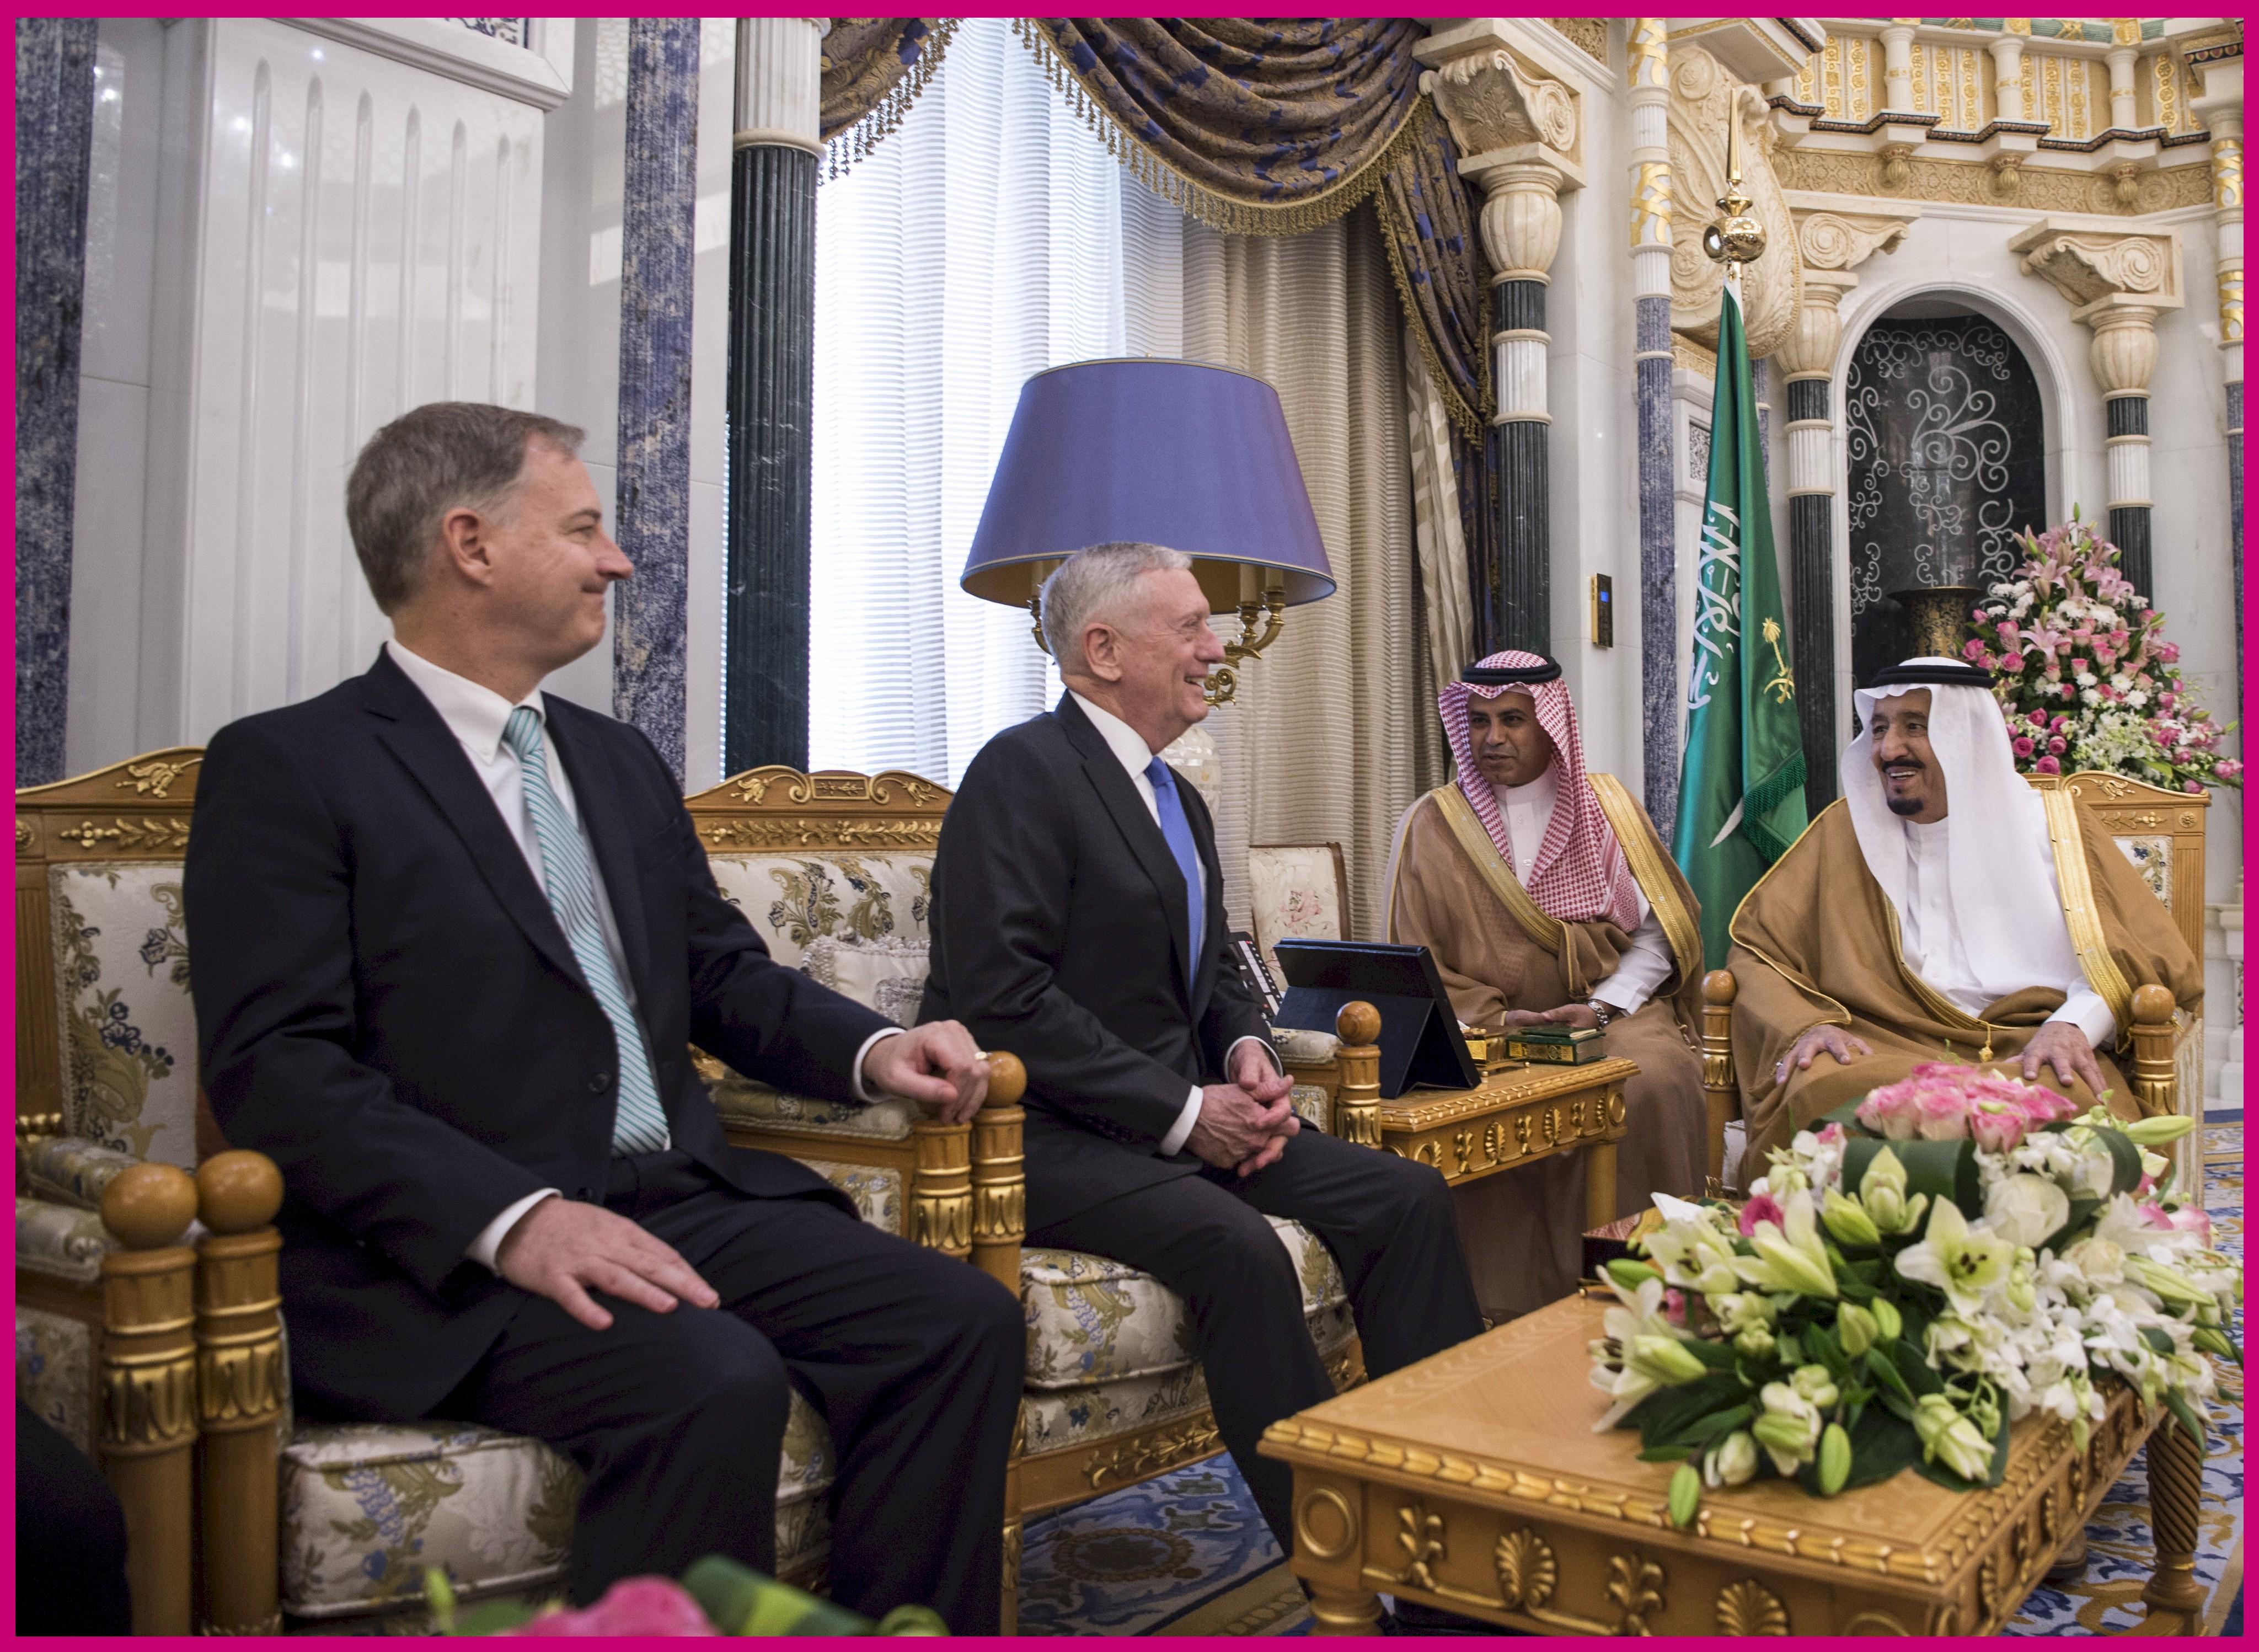 Secretary of Defense Jim Mattis meets with Saudi Arabia's King Salman Bin Abdulaziz Al-Saud in Riyadh, Saudi Arabia, April 19, 2017. (DOD photo by U.S. Air Force Tech. Sgt. Brigitte N. Brantley)